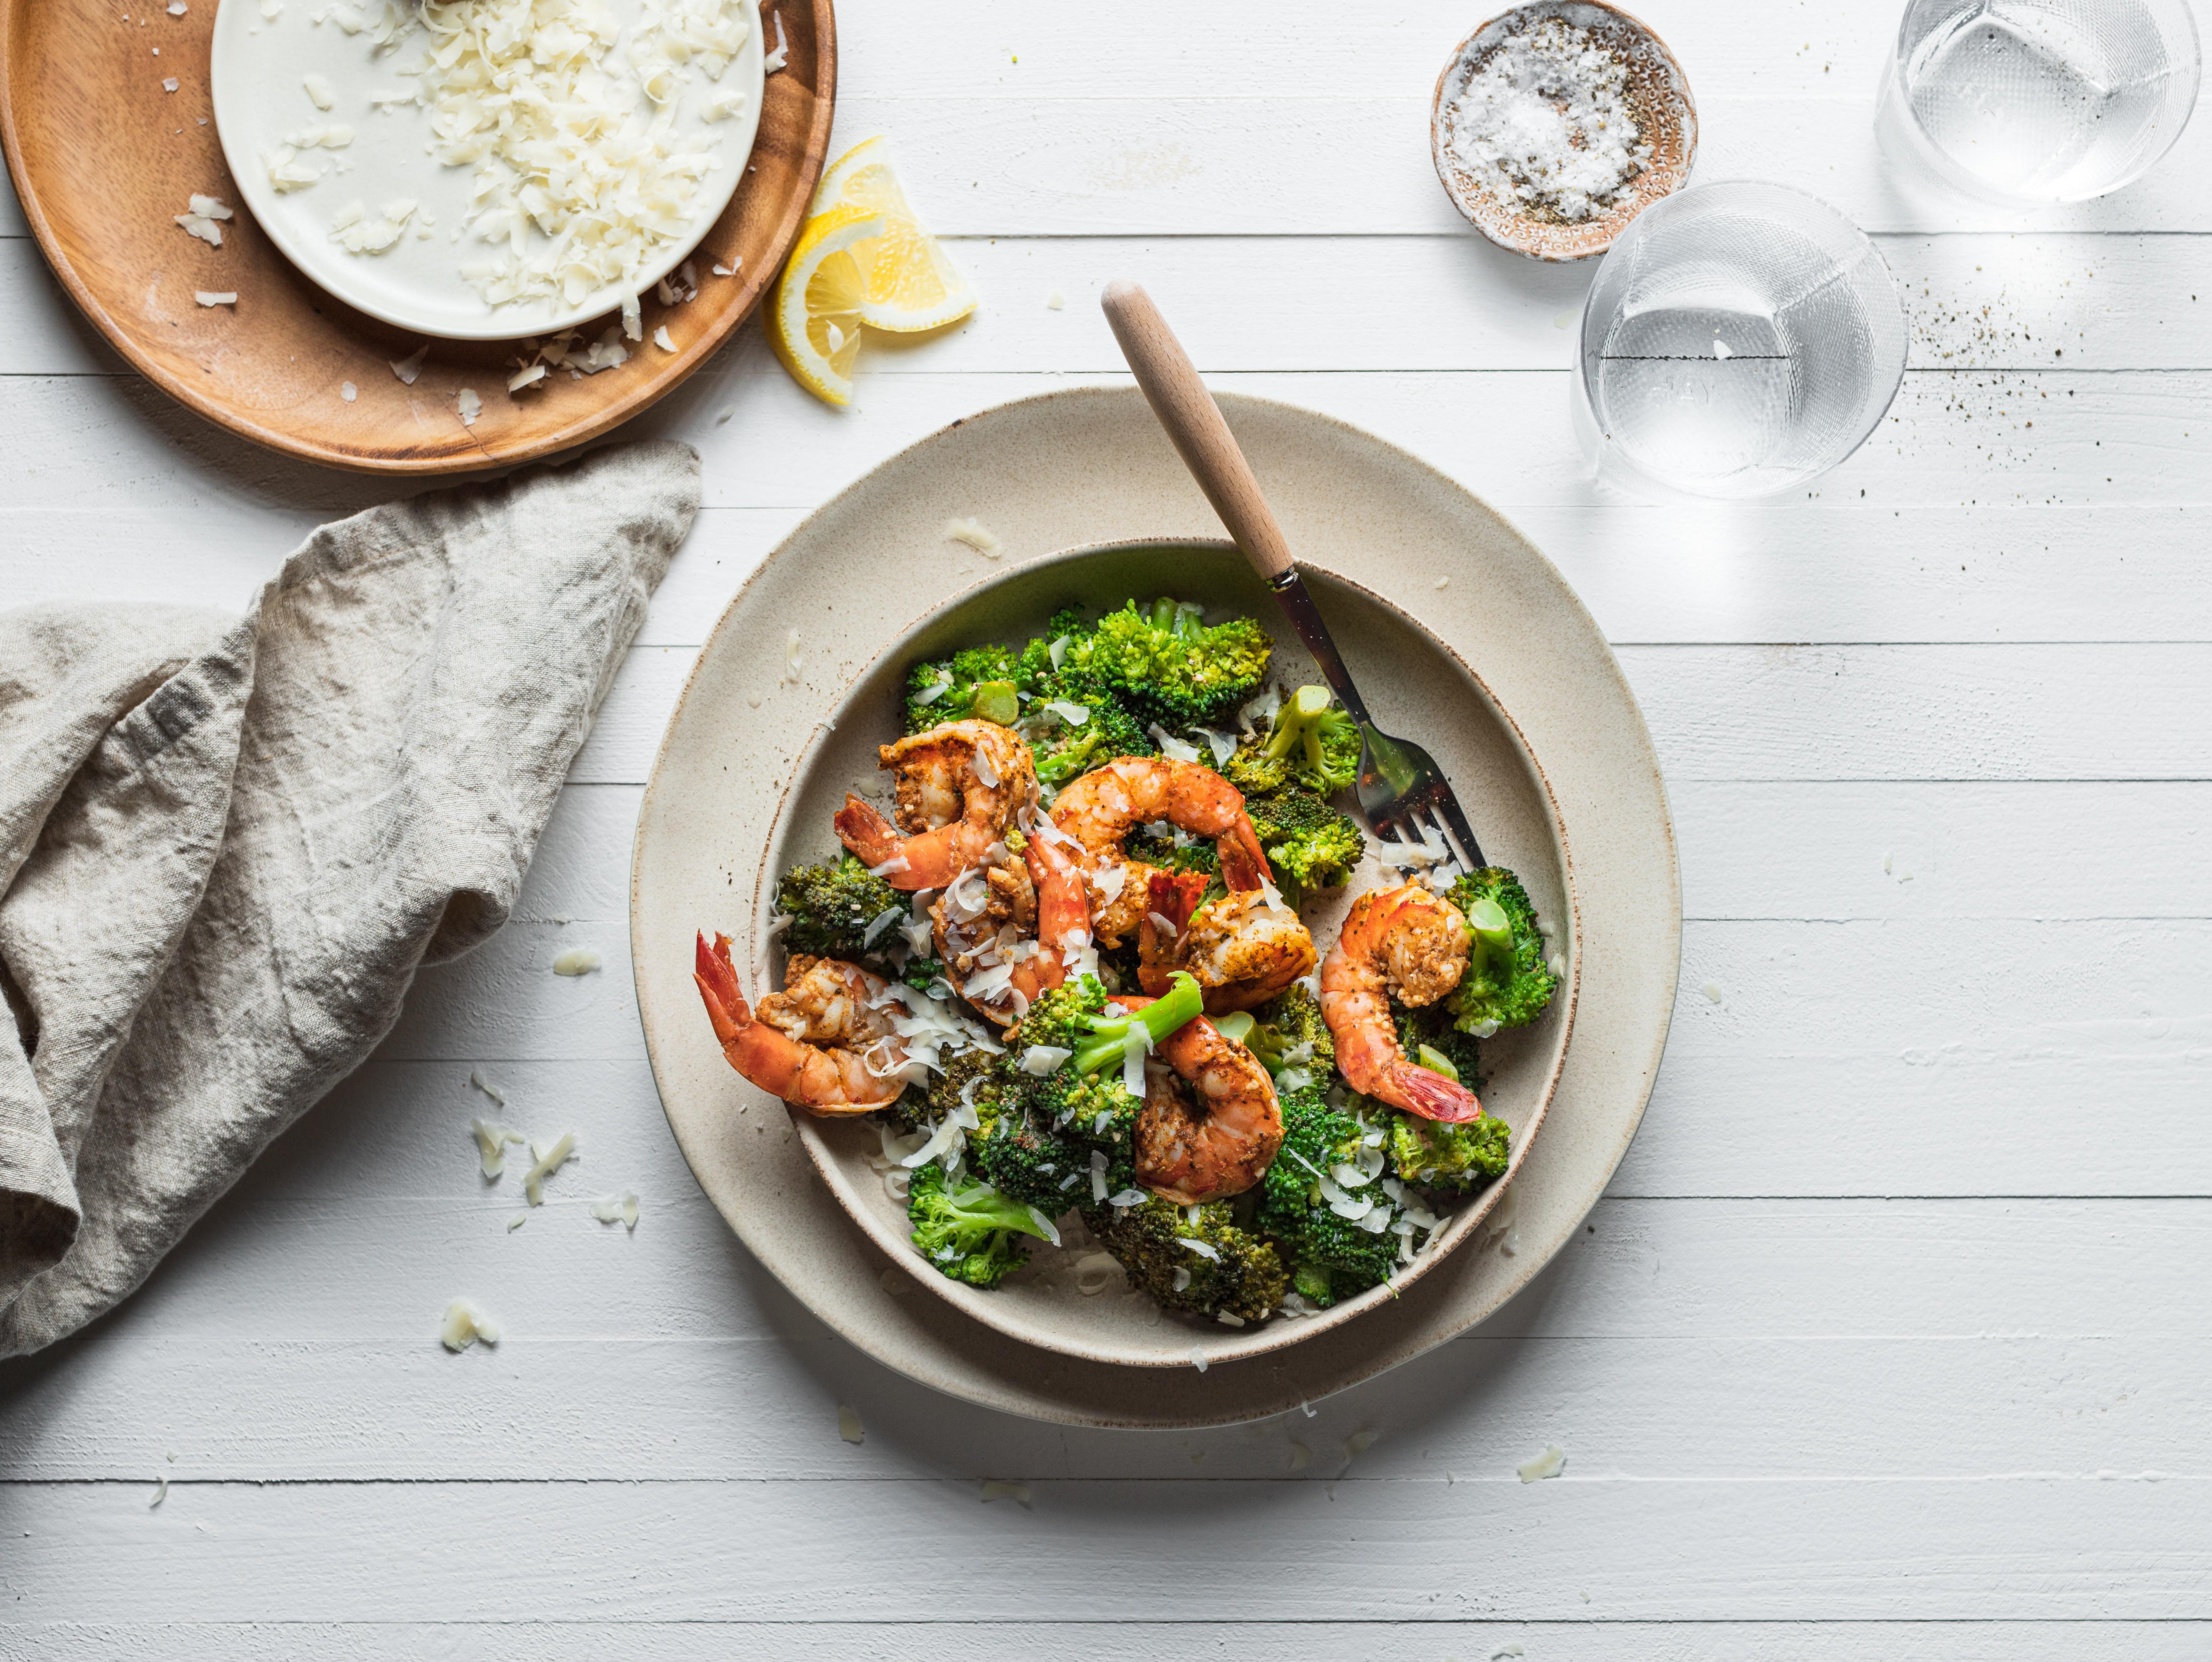 Lemon Parmesan Shrimp & Broccoli